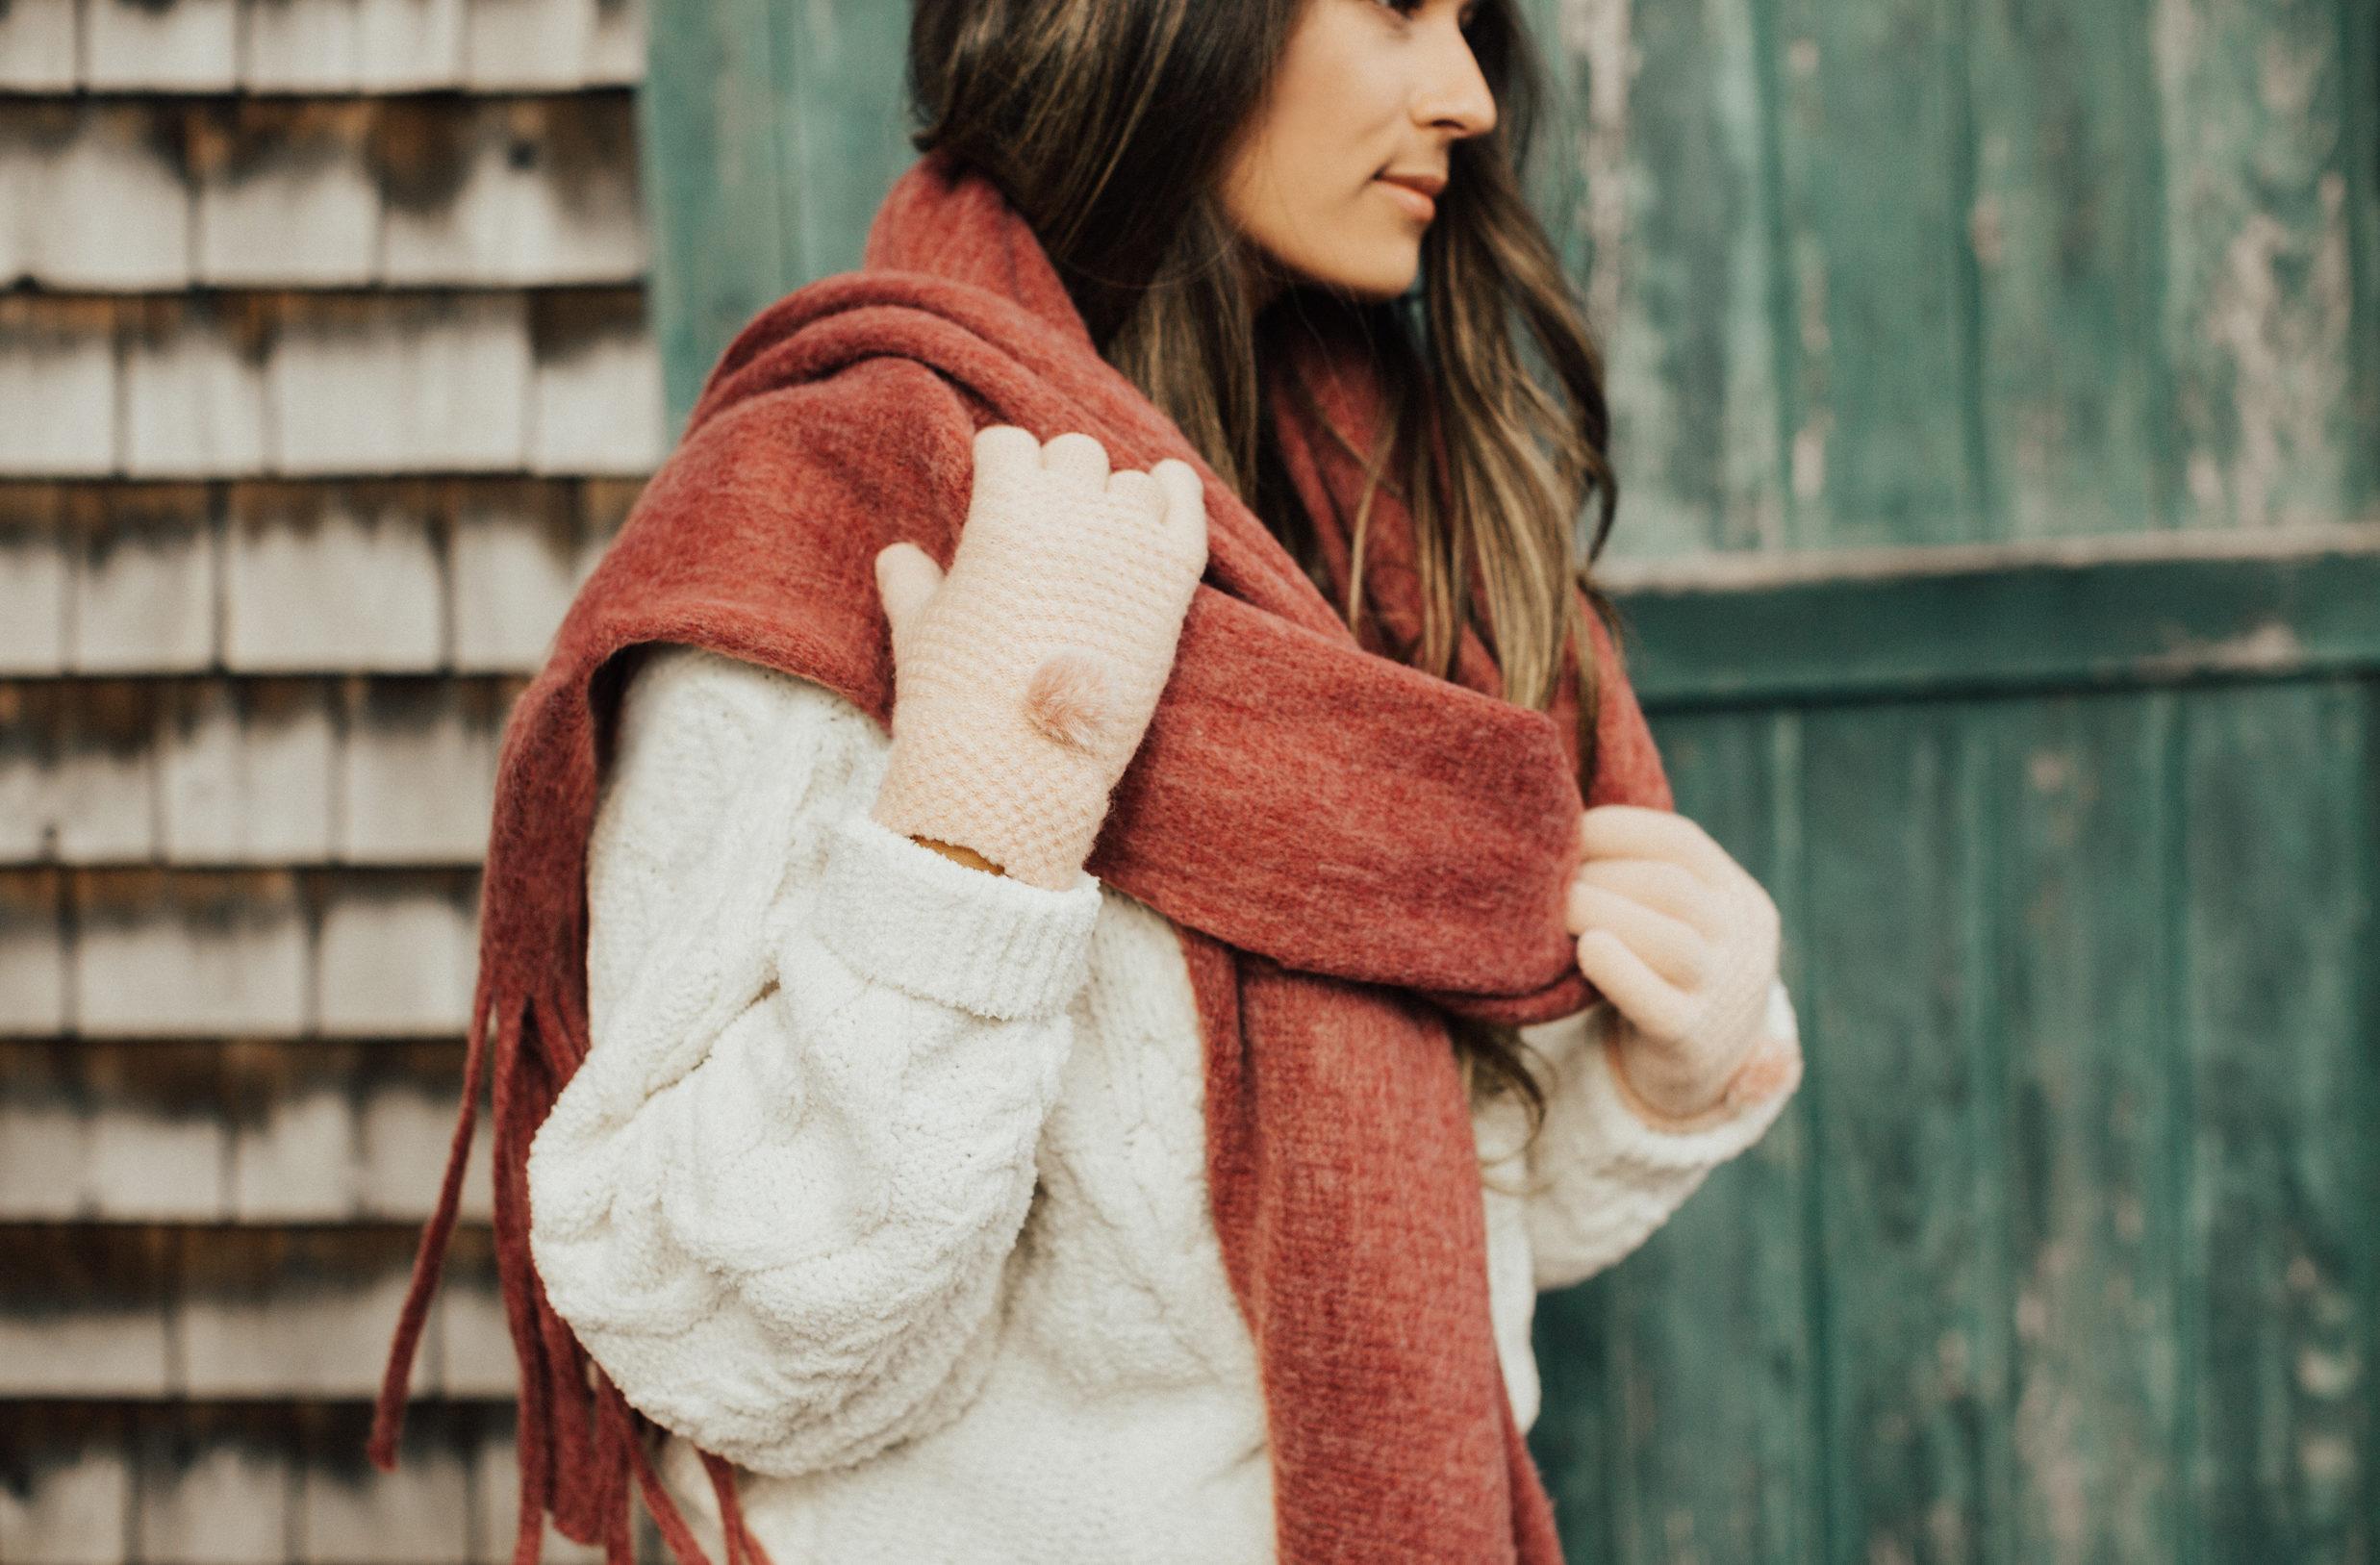 Featured On Anthropologie | Shades of Fall | Fall Fashion feature with Anthropologie | Fall Trends with Travel Blogger Elana Jadallah | Anthropologie Scarf | Best Looks of Fall with Anthropologie | Exploring Camden Maine | Travel Diary Camden Maine via @elanaloo + elanaloo.com